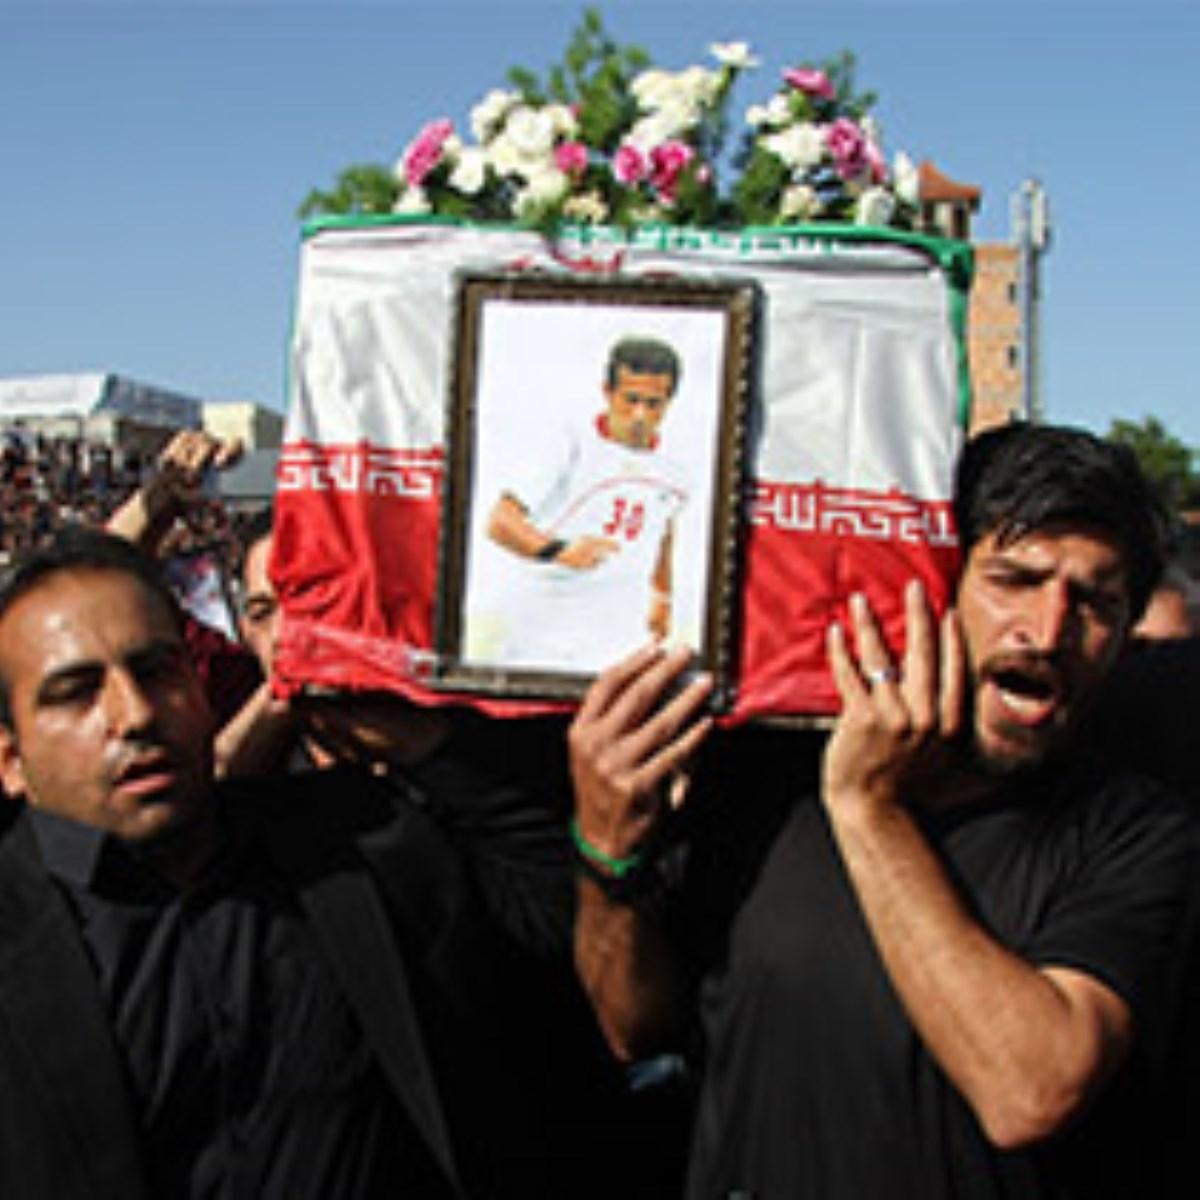 گزارش تصویری /  تشییع پیکر مرحوم مهرداد اولادی